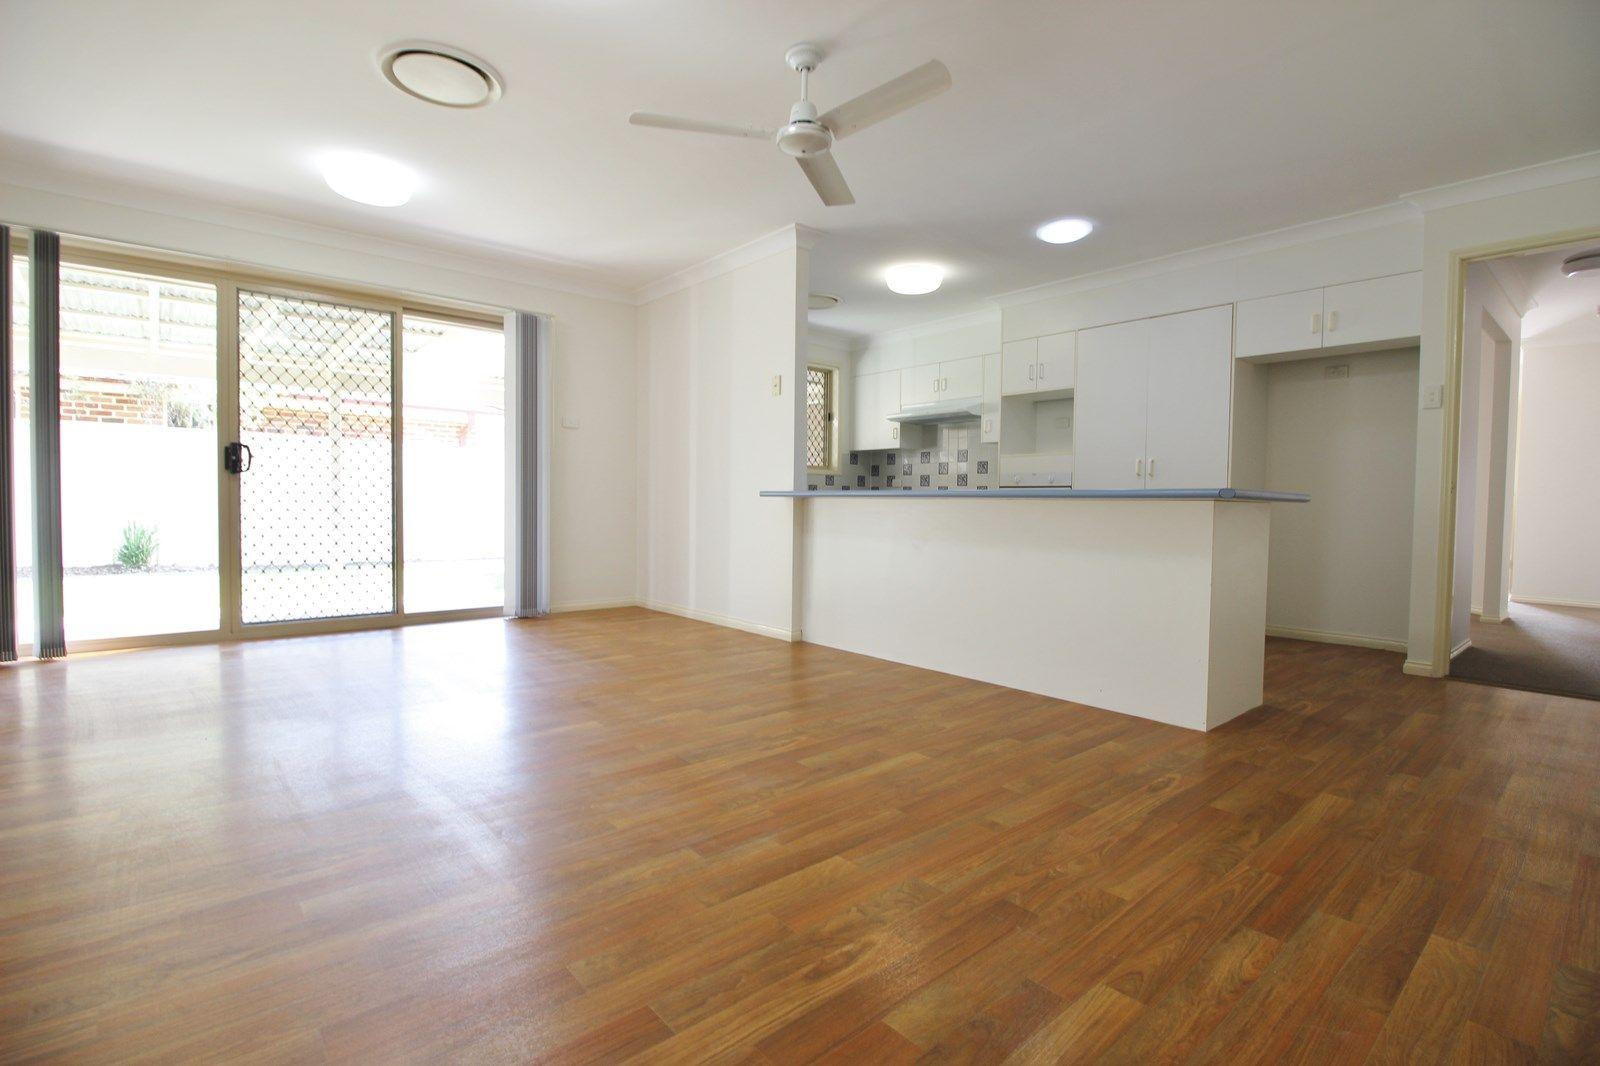 14 Gordon Reeve Close, Raymond Terrace NSW 2324, Image 2